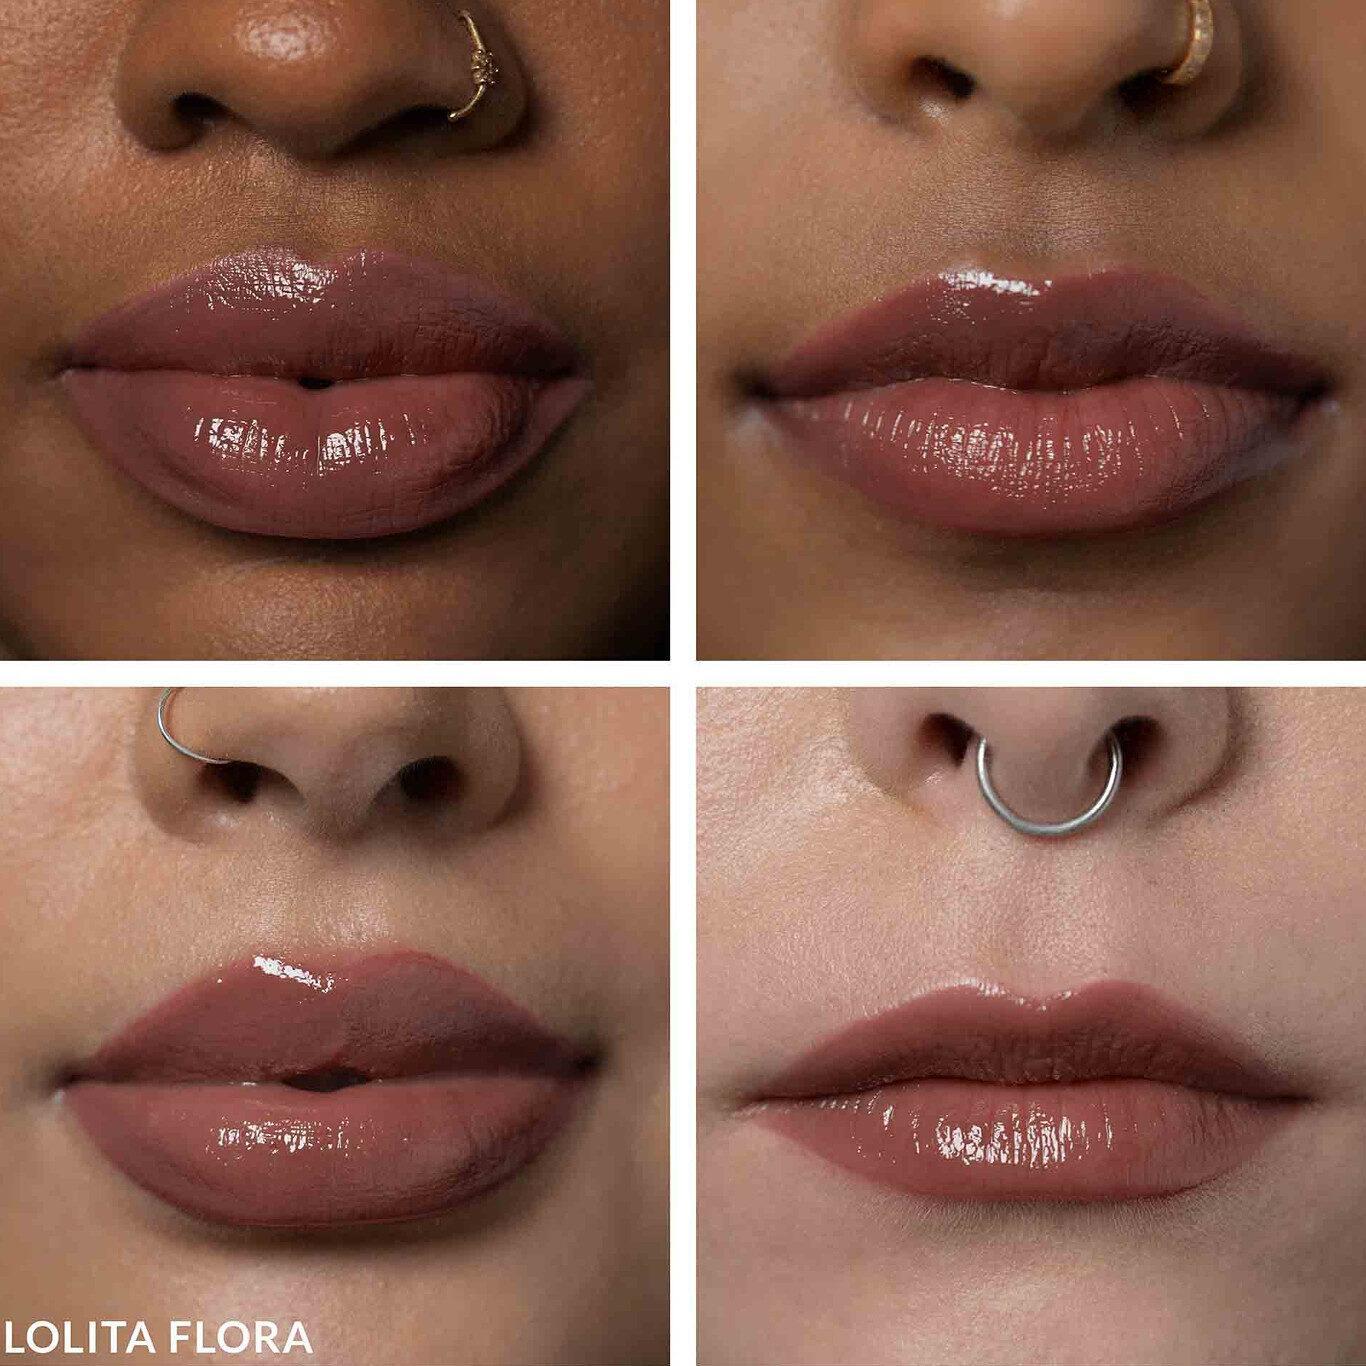 KVD Vegan Beauty XO Lip Gloss In Lolita Flora